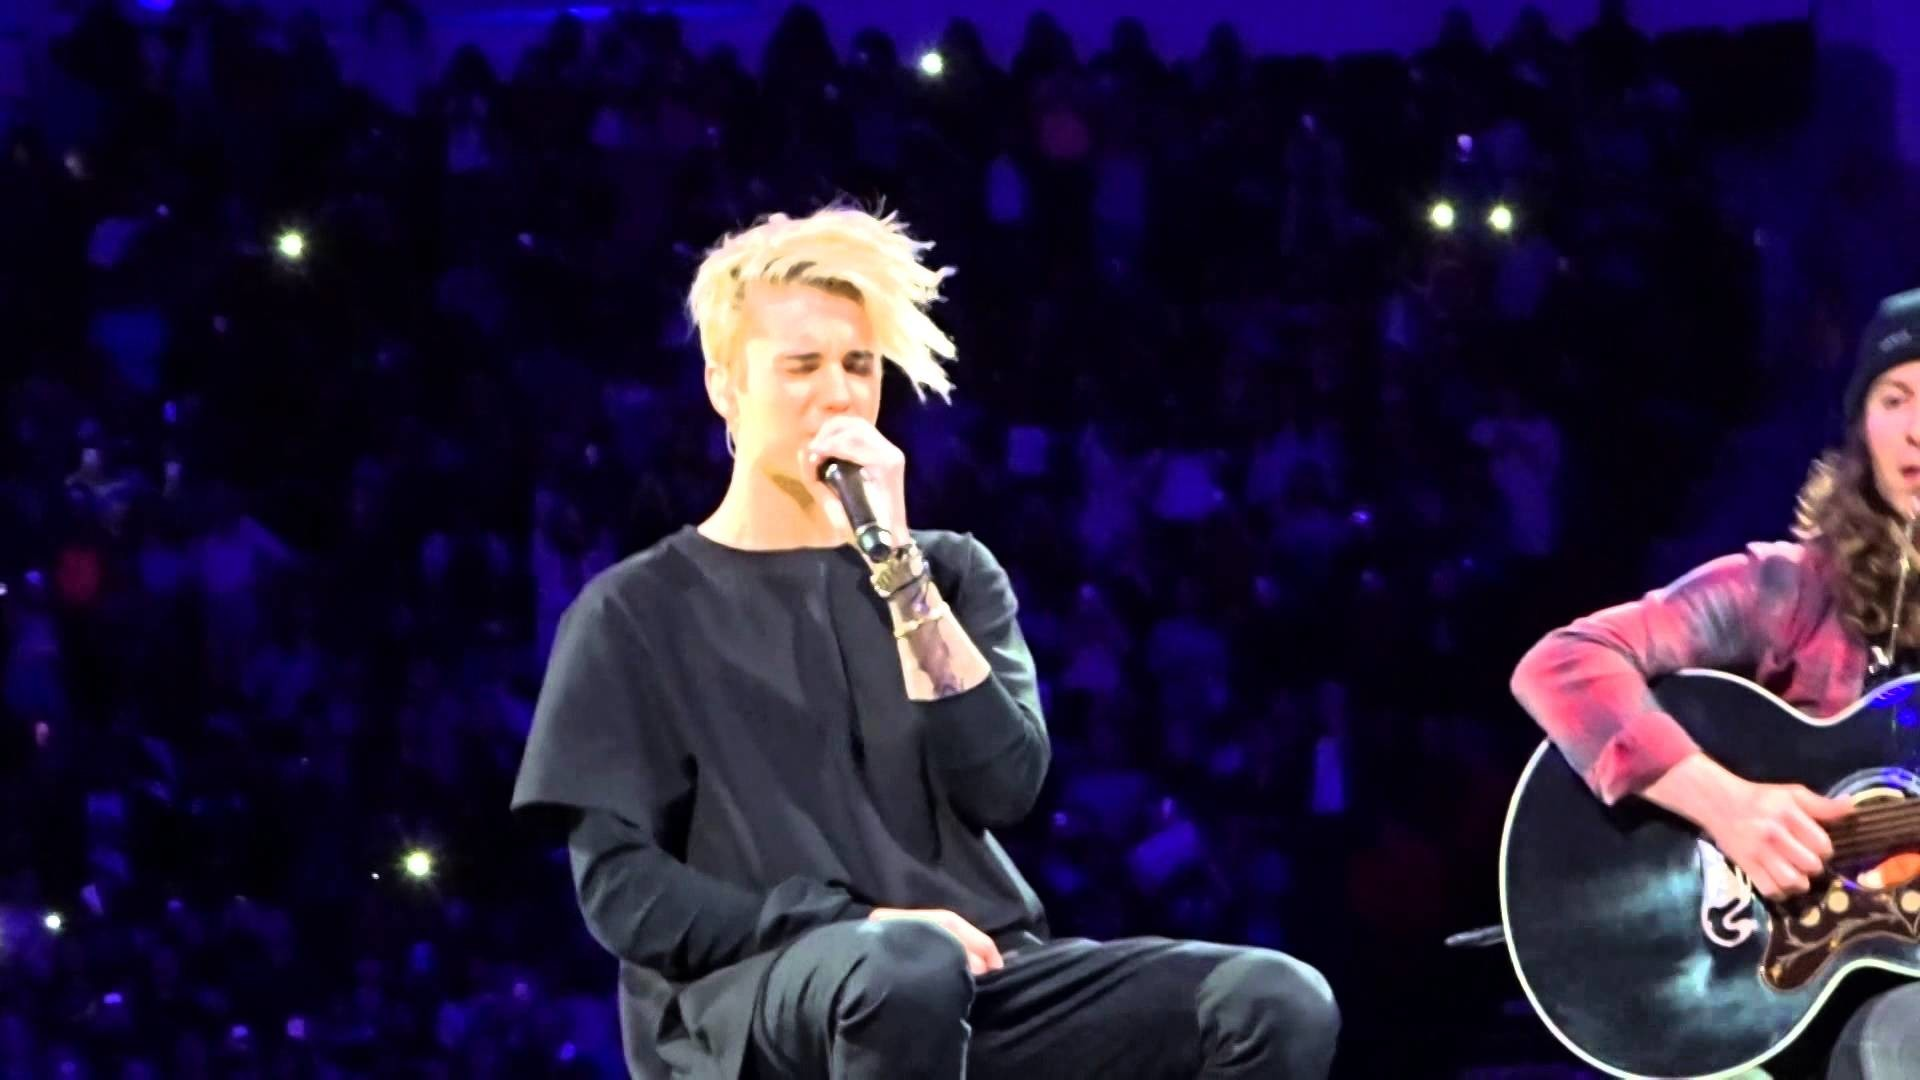 Justin Bieber 2018 Wallpaper (80+ pictures)